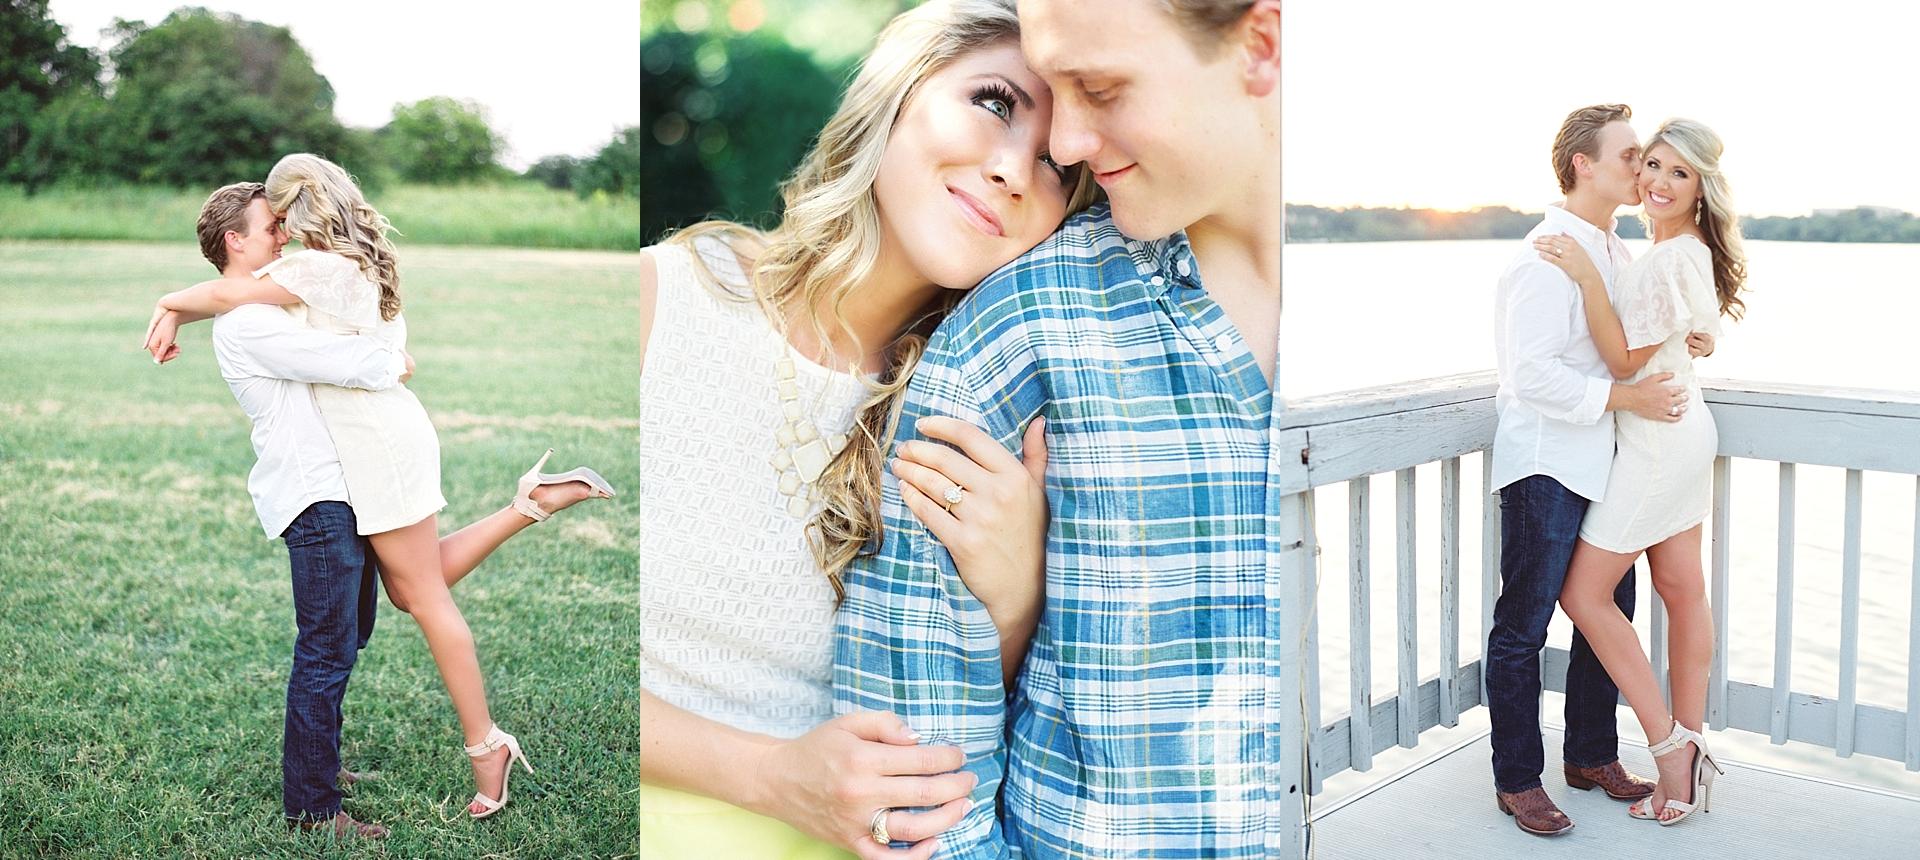 Dallas Weddings, Dallas Photographers, DFW Photographers, Texas Photographers, Austin Wedding Photographers, Dallas Wedding Photographers, Fine Art Wedding Photographers, Heather Sanderson Photography, Heather Sanderson Photo